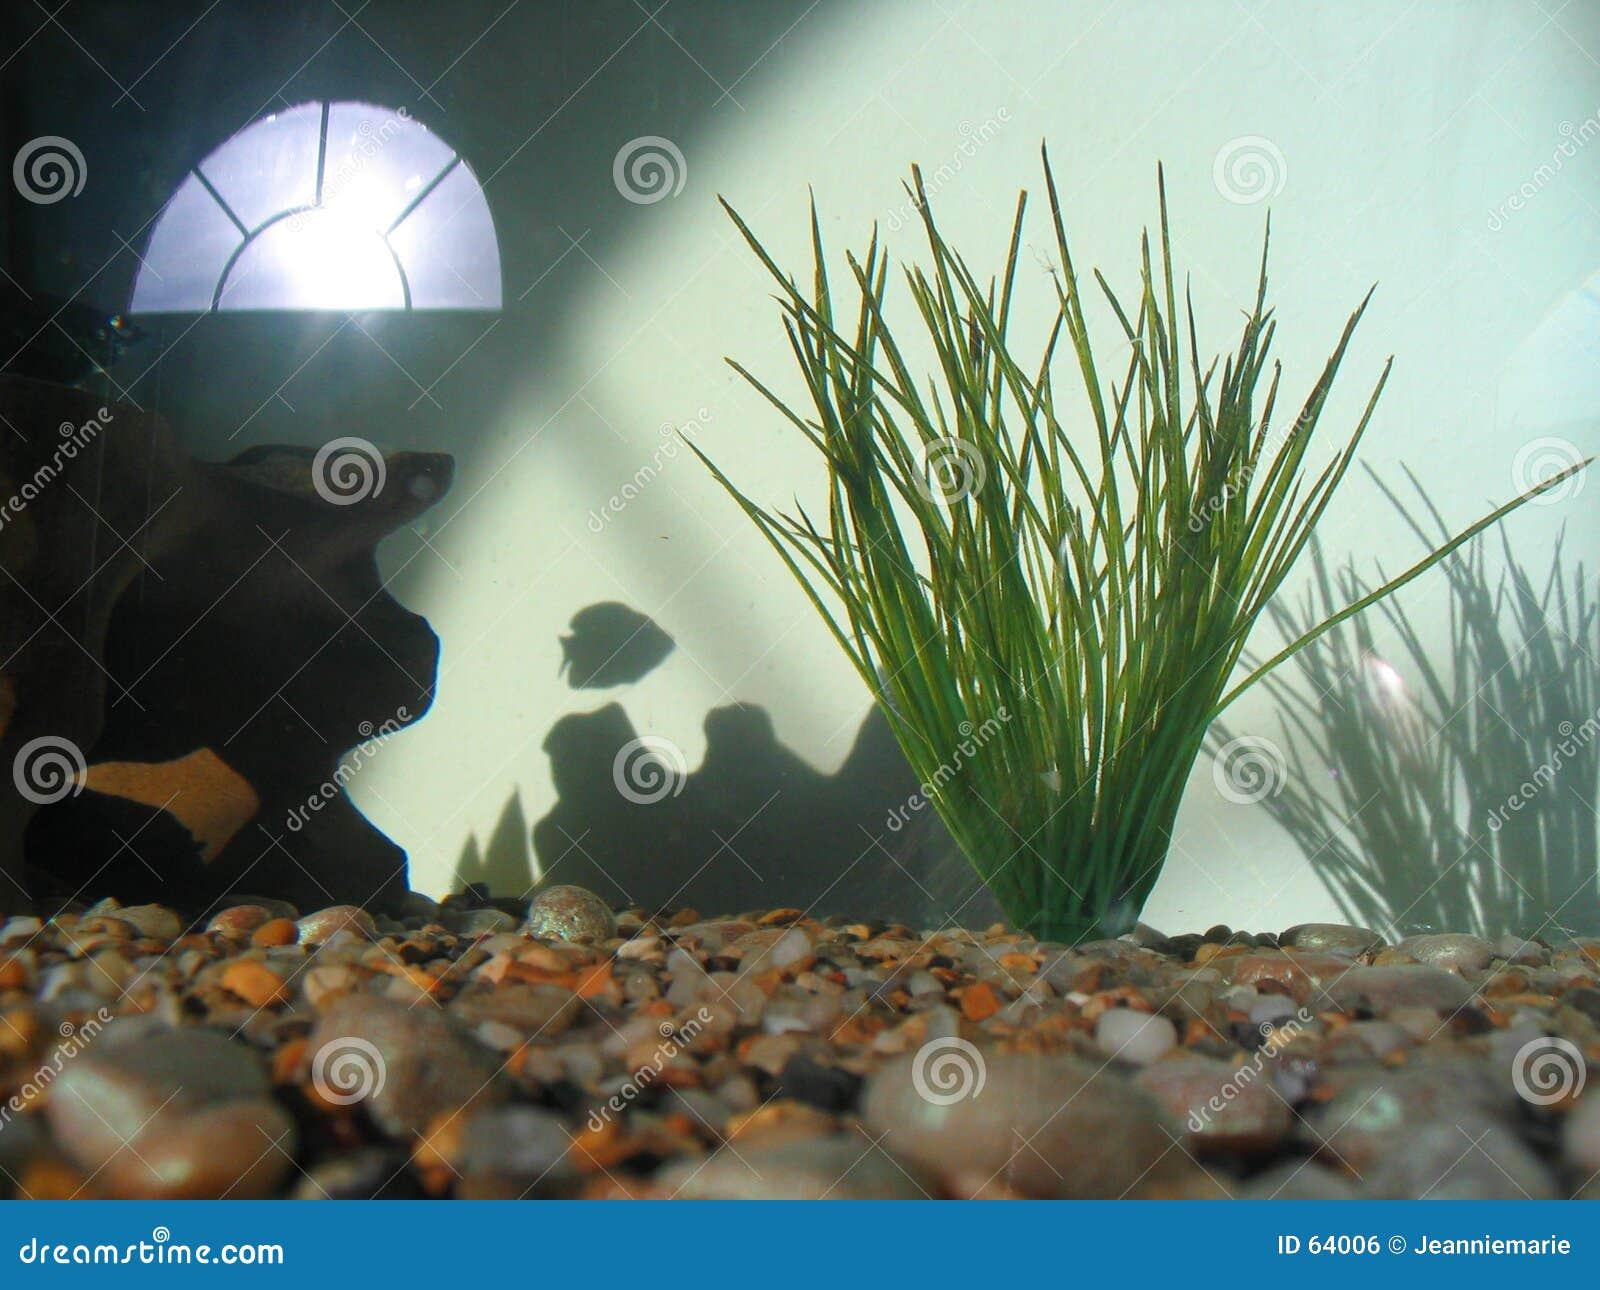 Download όλα τα ψάρια έχουν πού στοκ εικόνες. εικόνα από σκιά, θλίψη - 64006